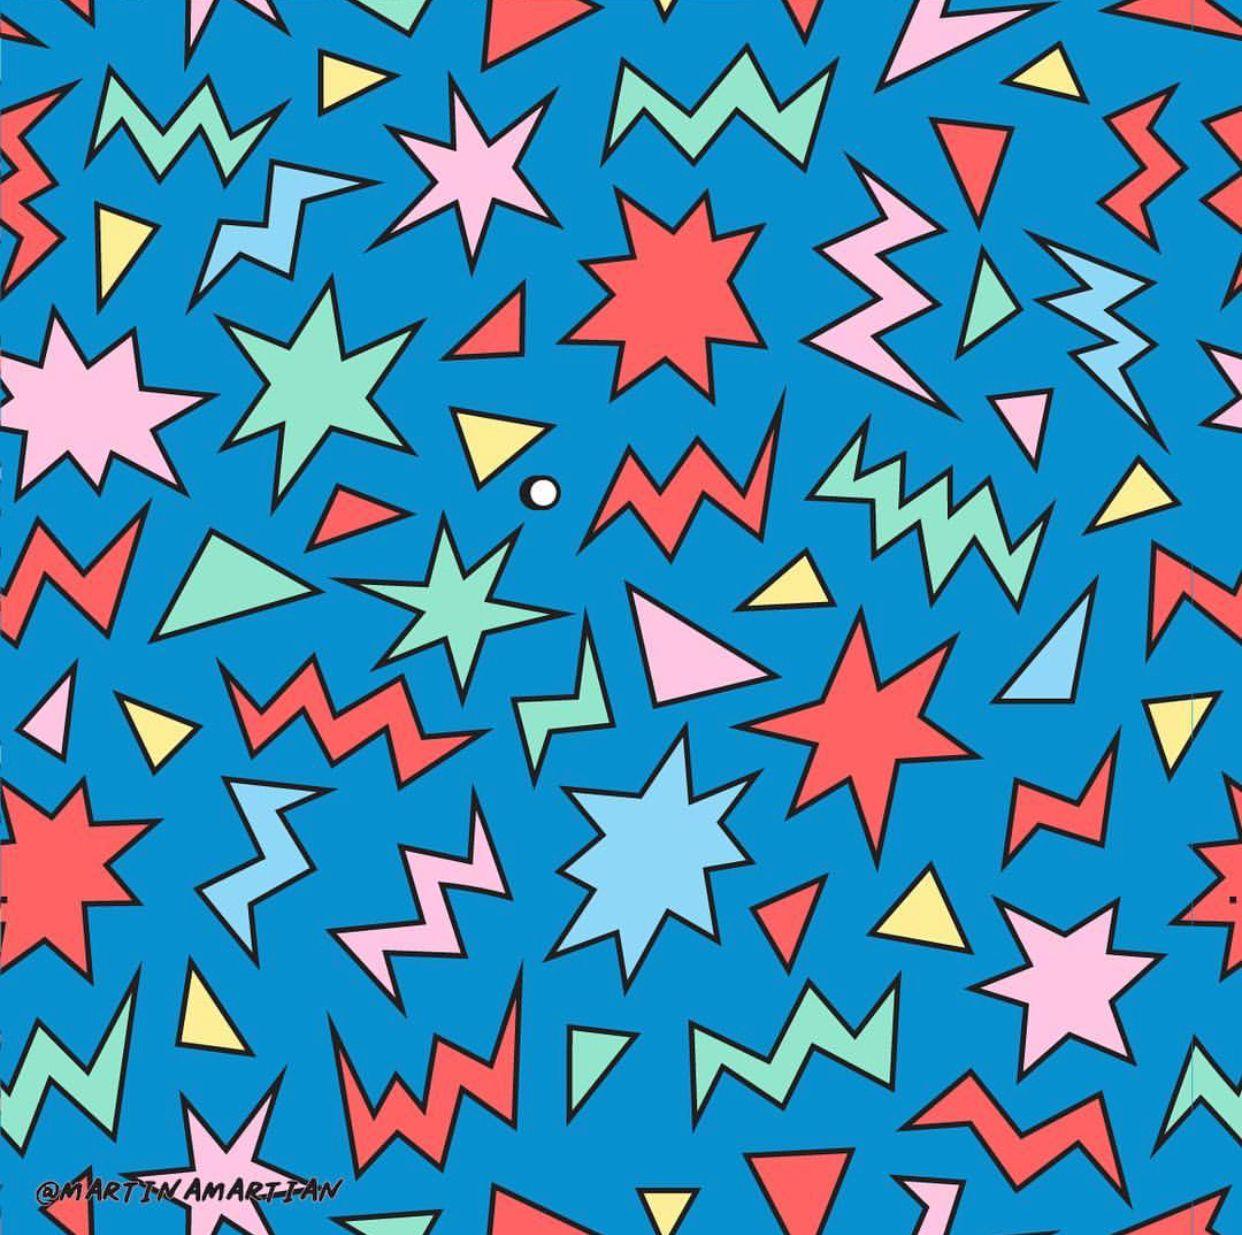 Repeat Pattern martinamartian Artsy background